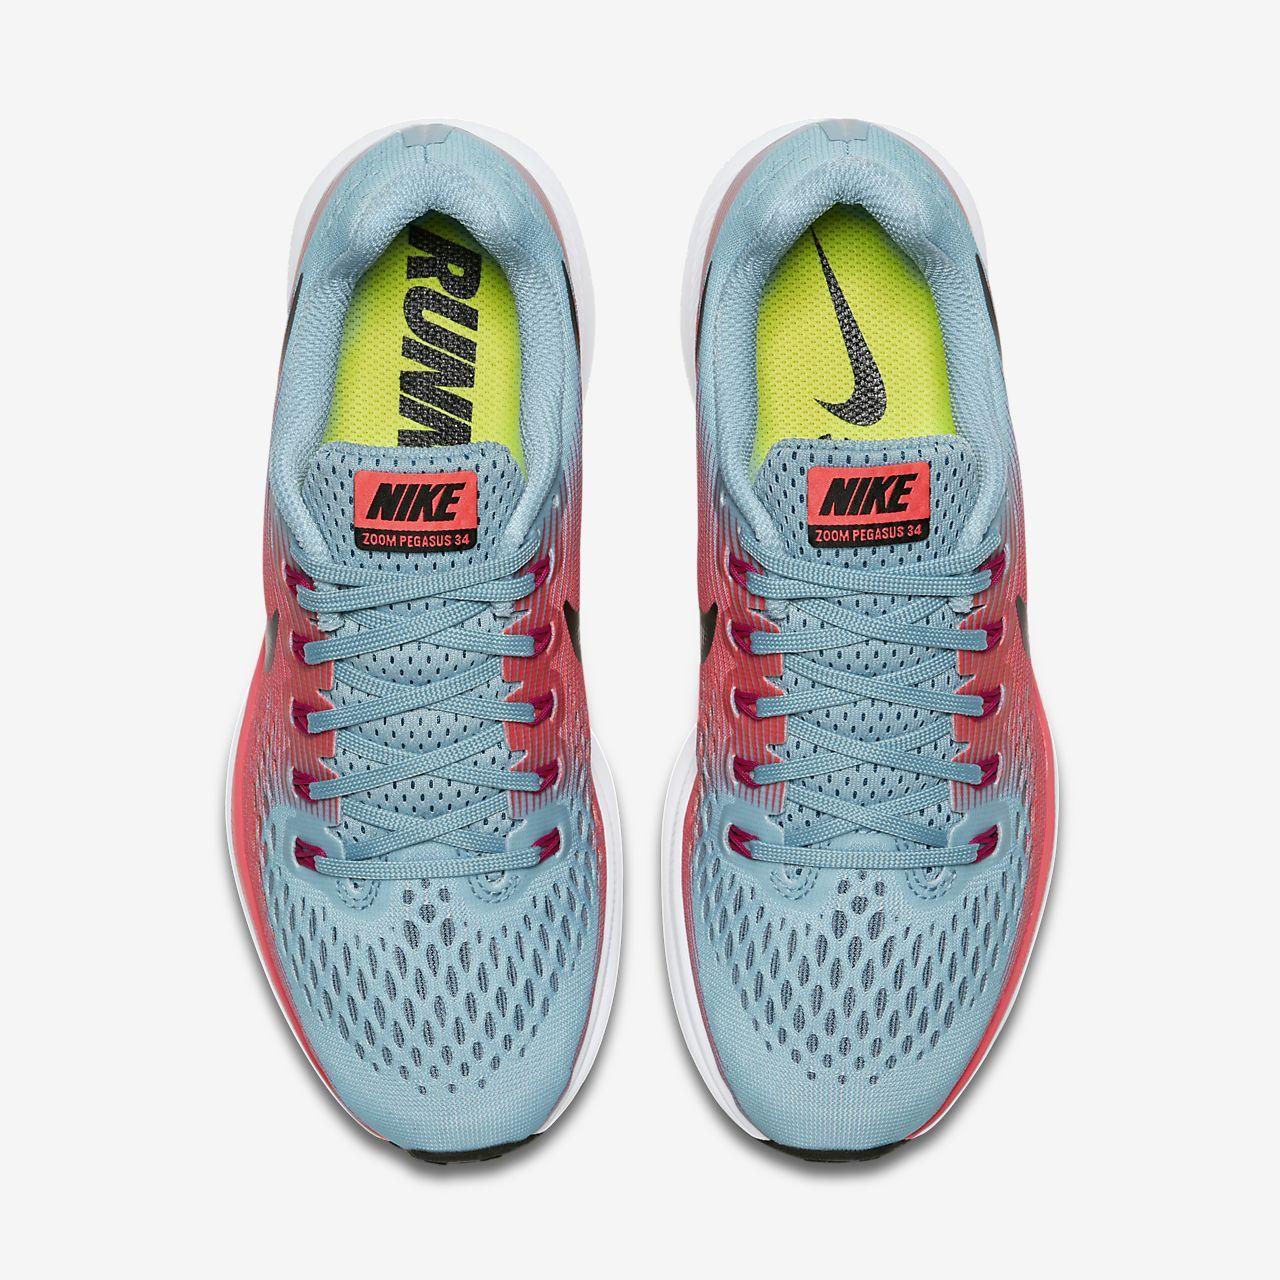 21fce14fc304 Nike Air Zoom Pegasus 34 Women s Running Shoe